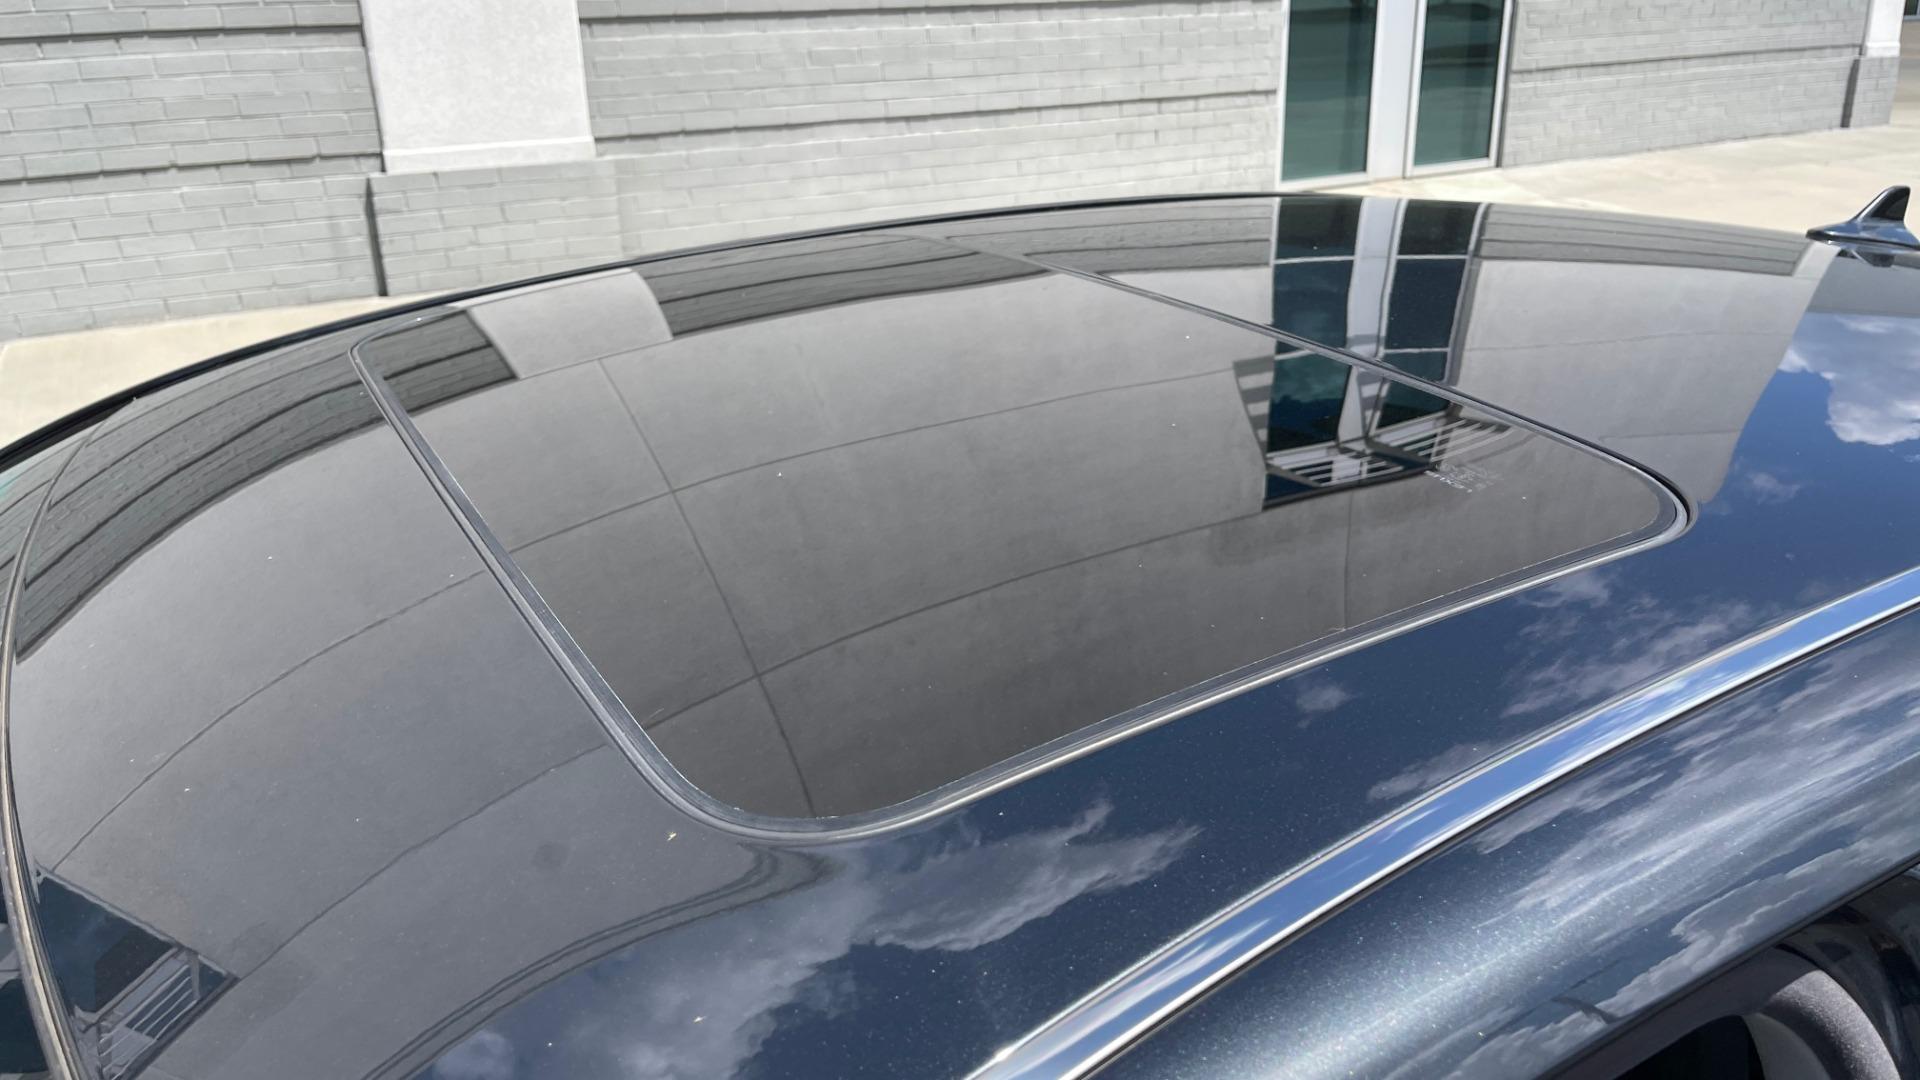 Used 2007 Lexus LS 460 SEDAN / COMFORT PKG / NAVIGATION / MARK LEVINSON / REARVIEW for sale $14,995 at Formula Imports in Charlotte NC 28227 8